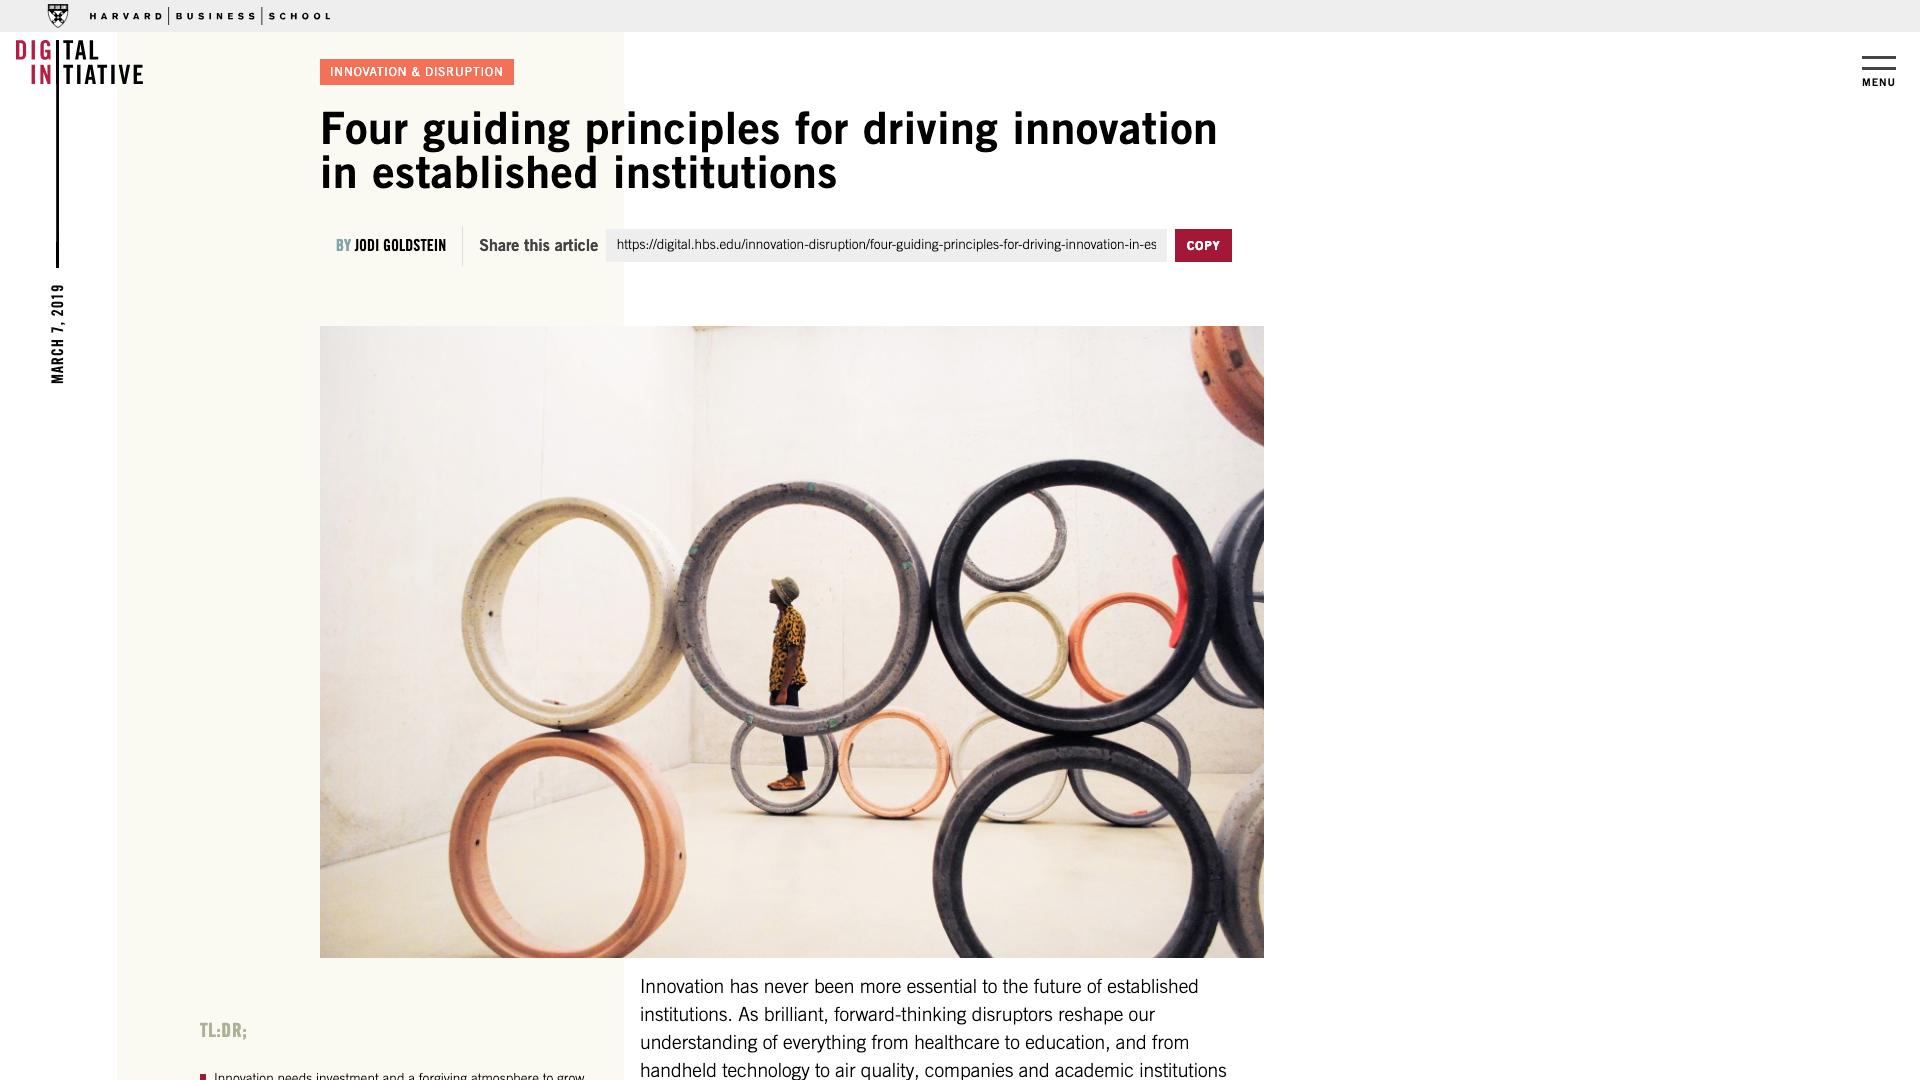 Photography - Digital Initiative by Harvard Business School